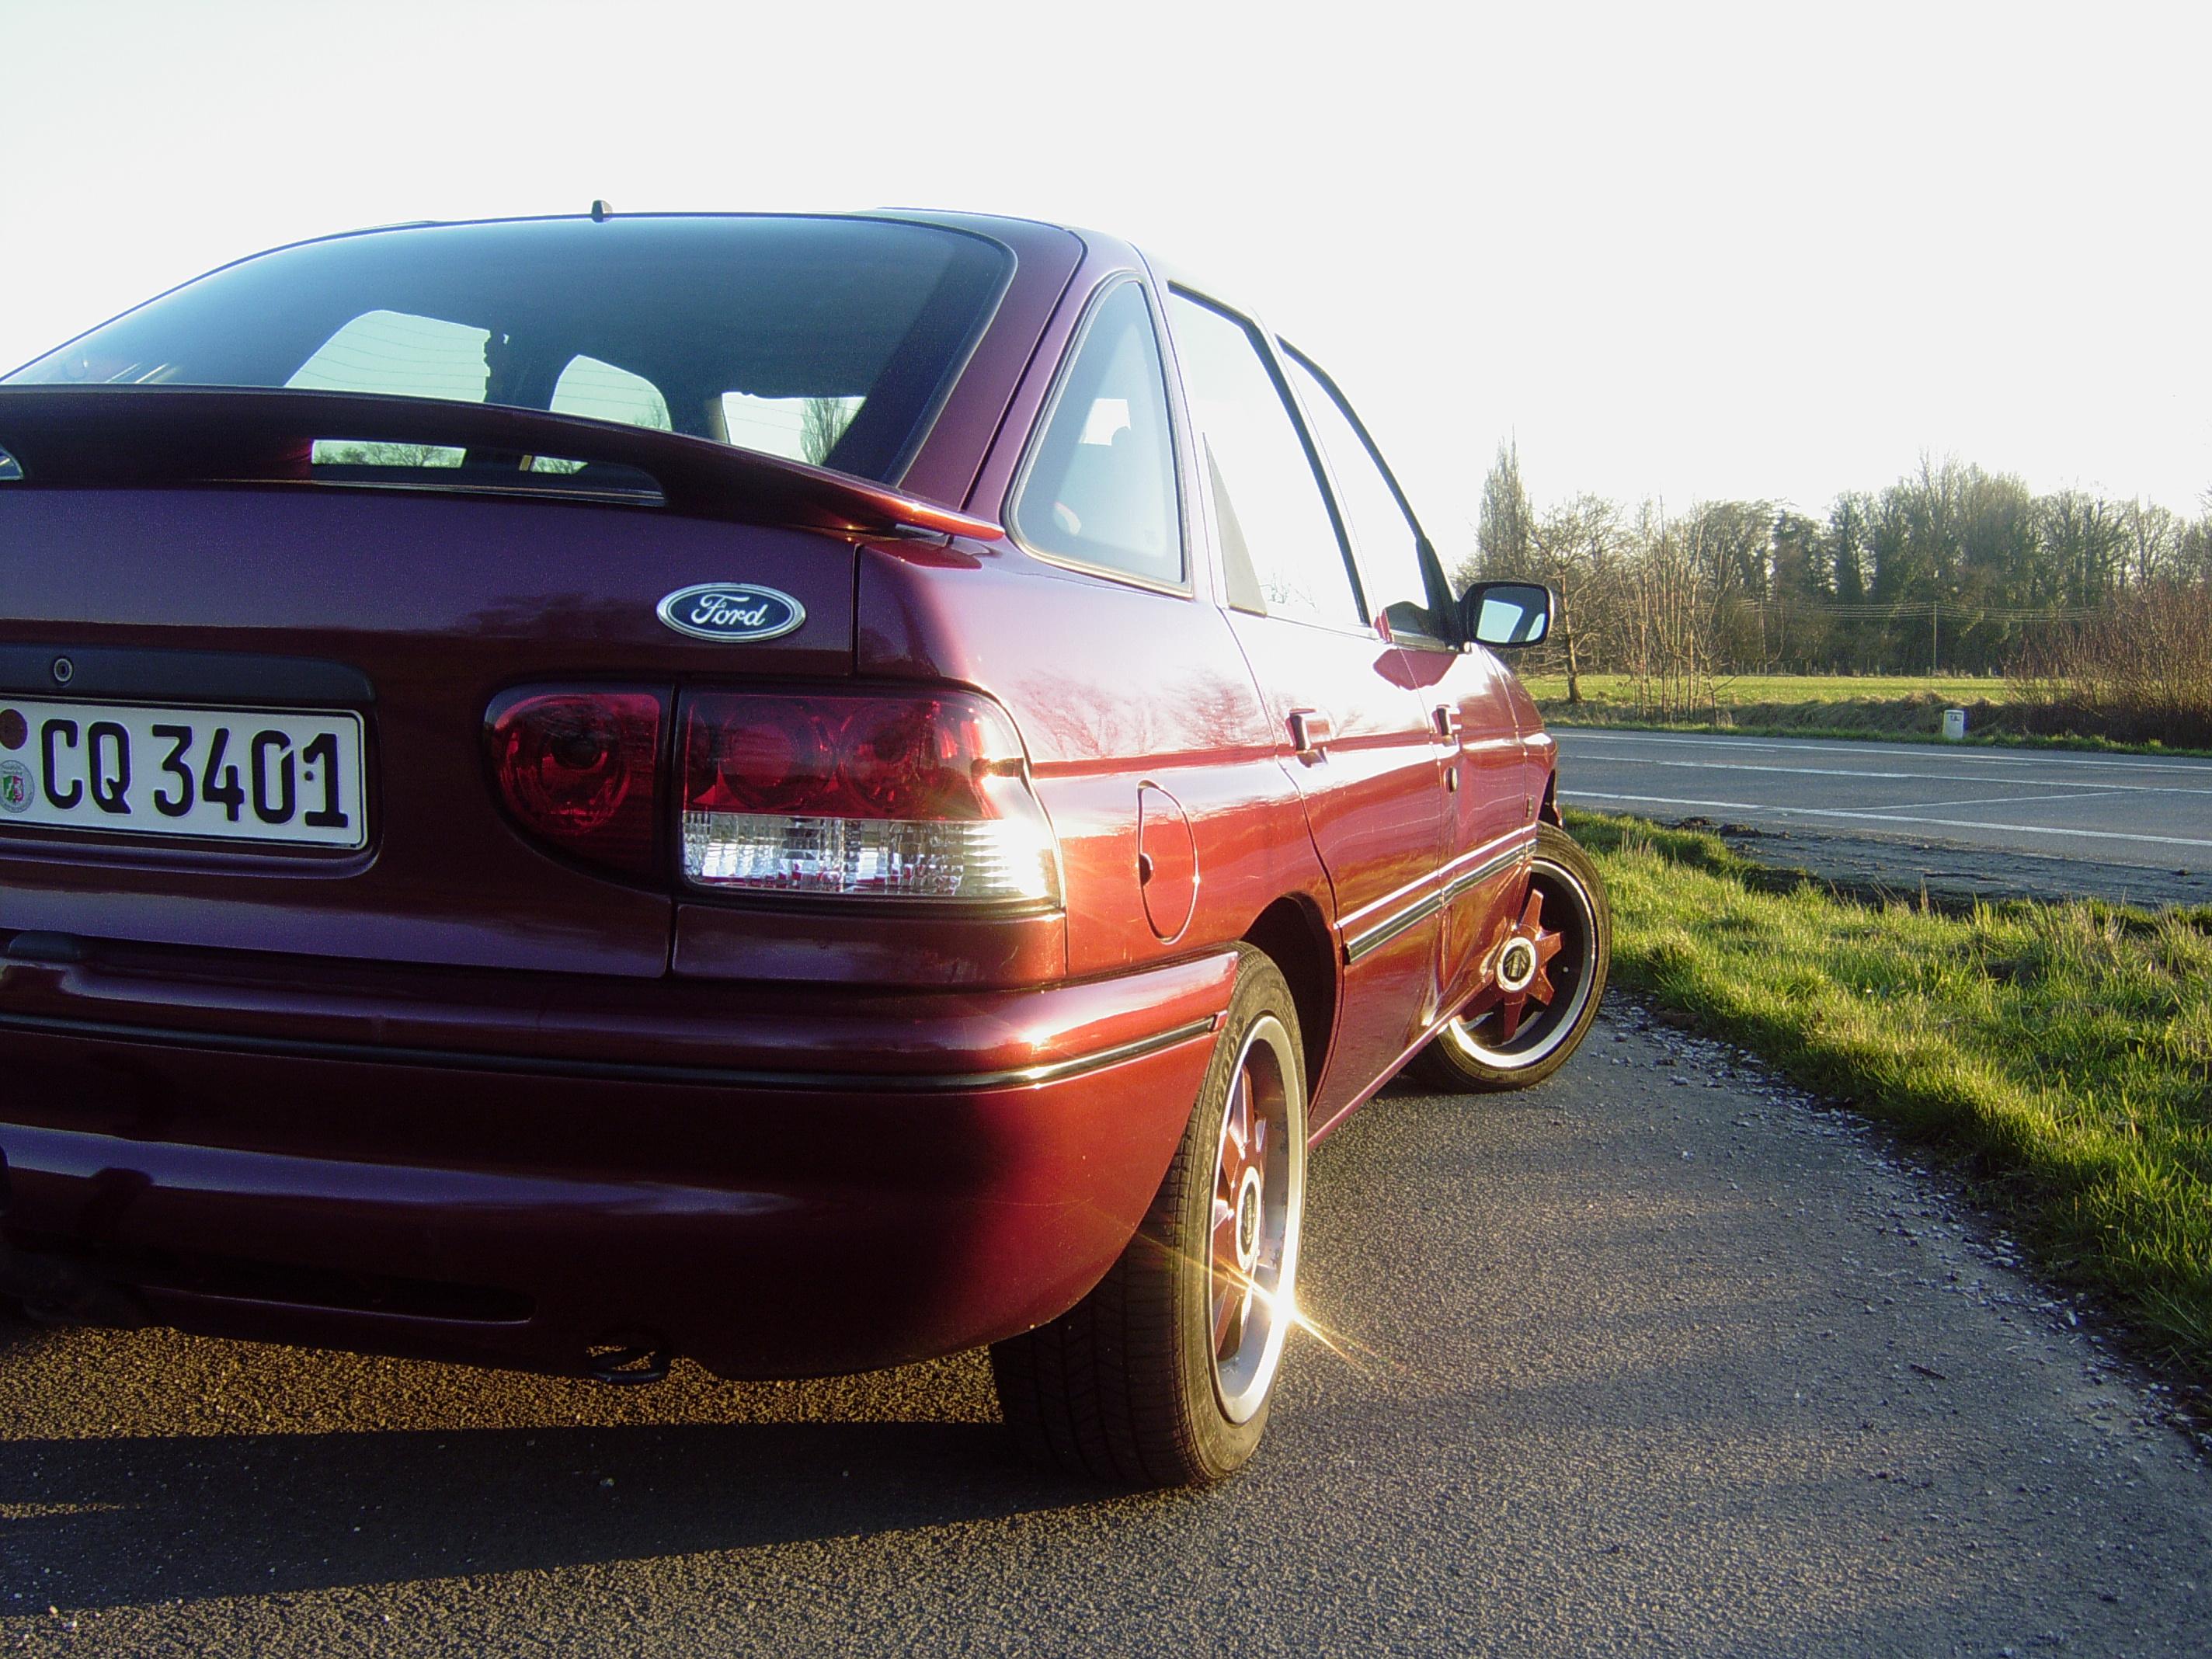 Ford Escort (Europe) - Wikipedia